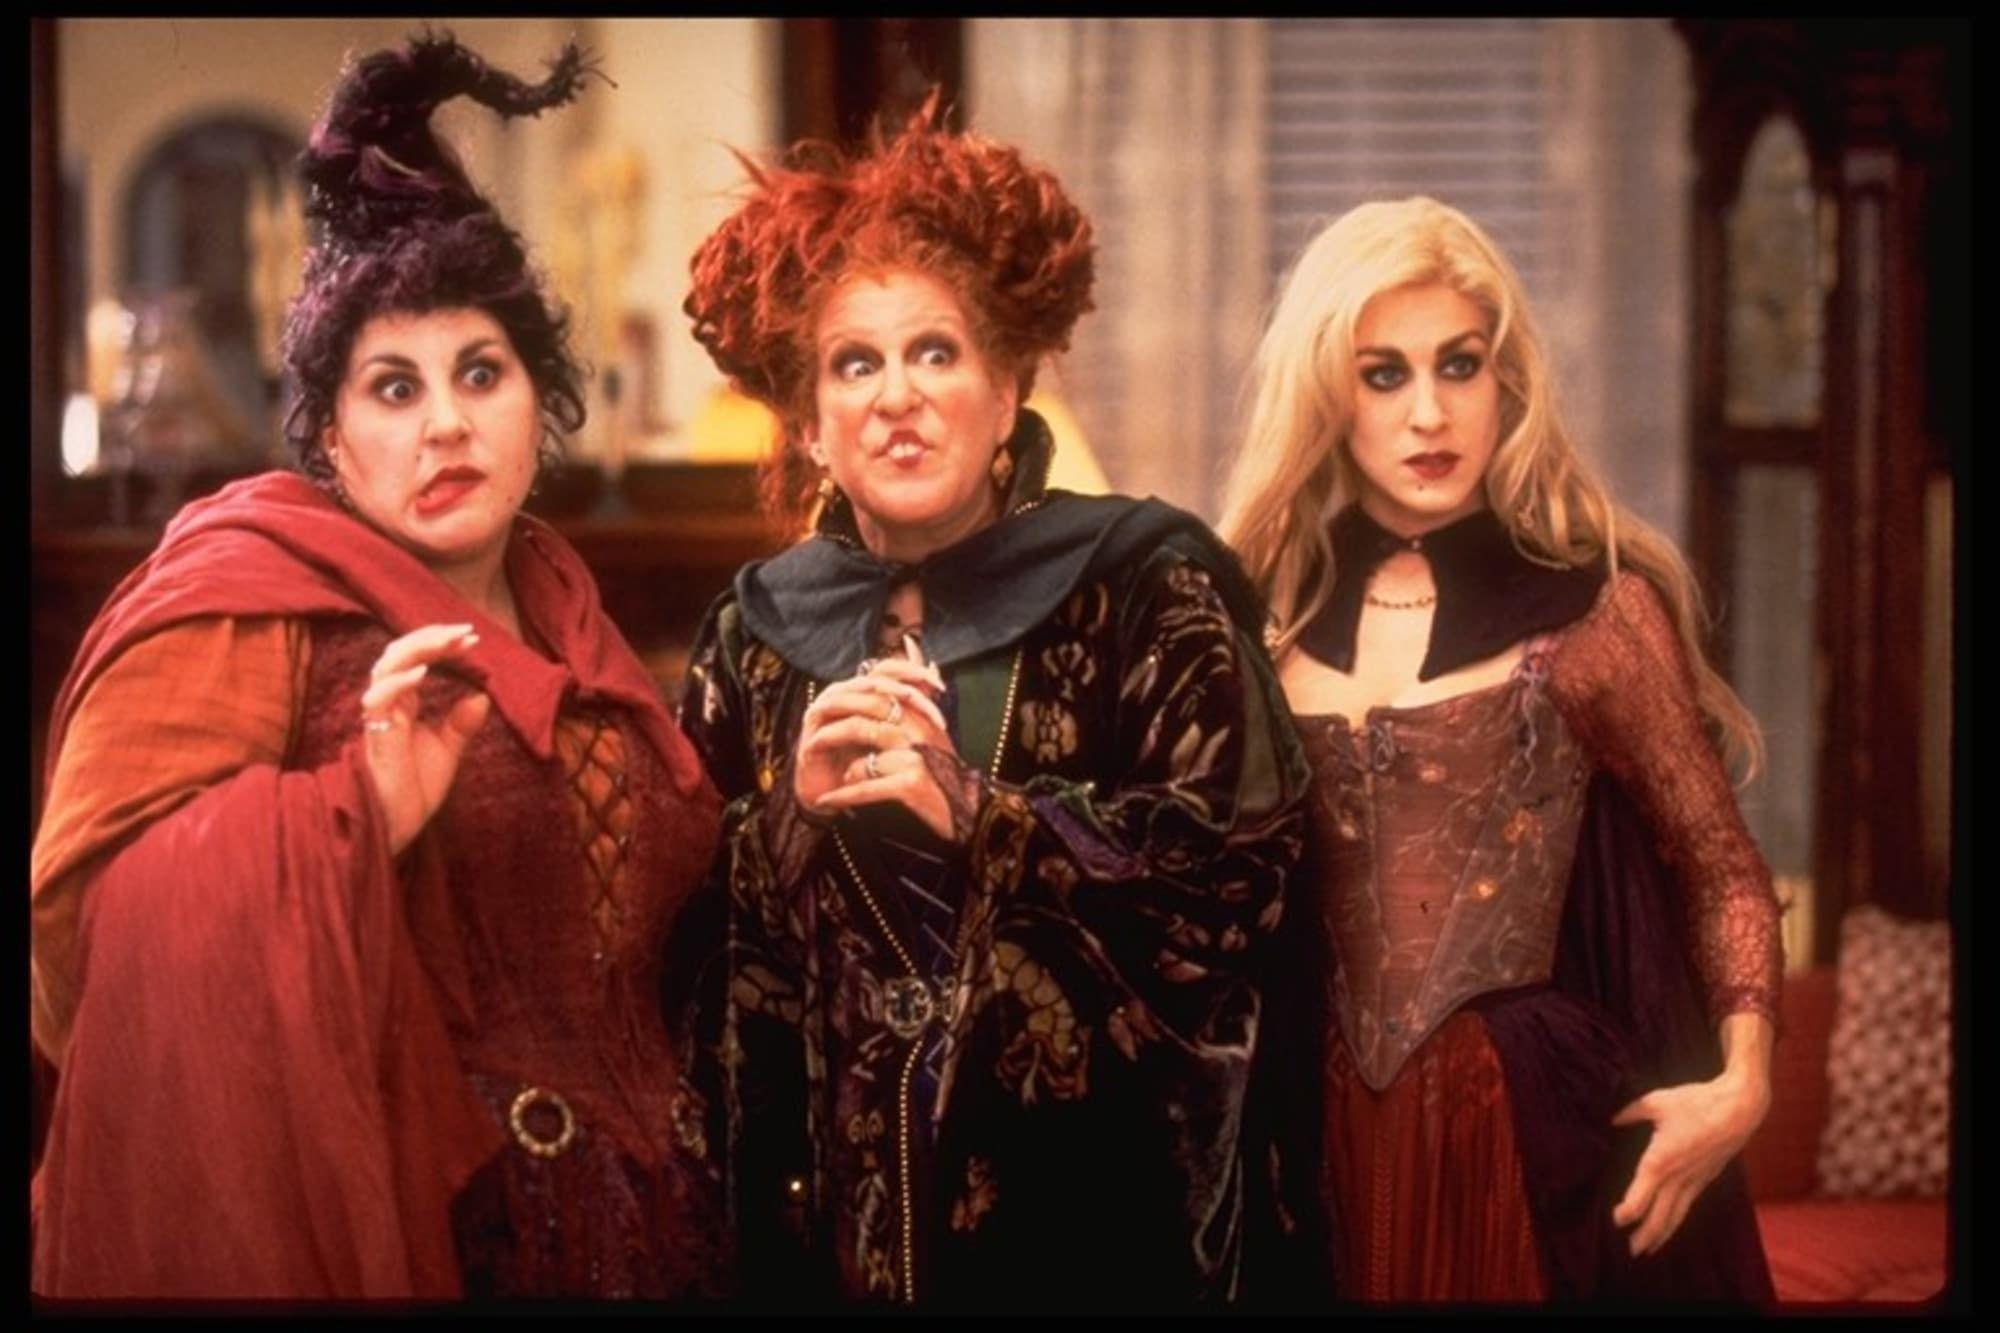 Hocus Pocus 2 Will All Three Sanderson Sisters Return Disneyplus In 2020 Classic Halloween Movies Hocus Pocus Characters Halloween Movies